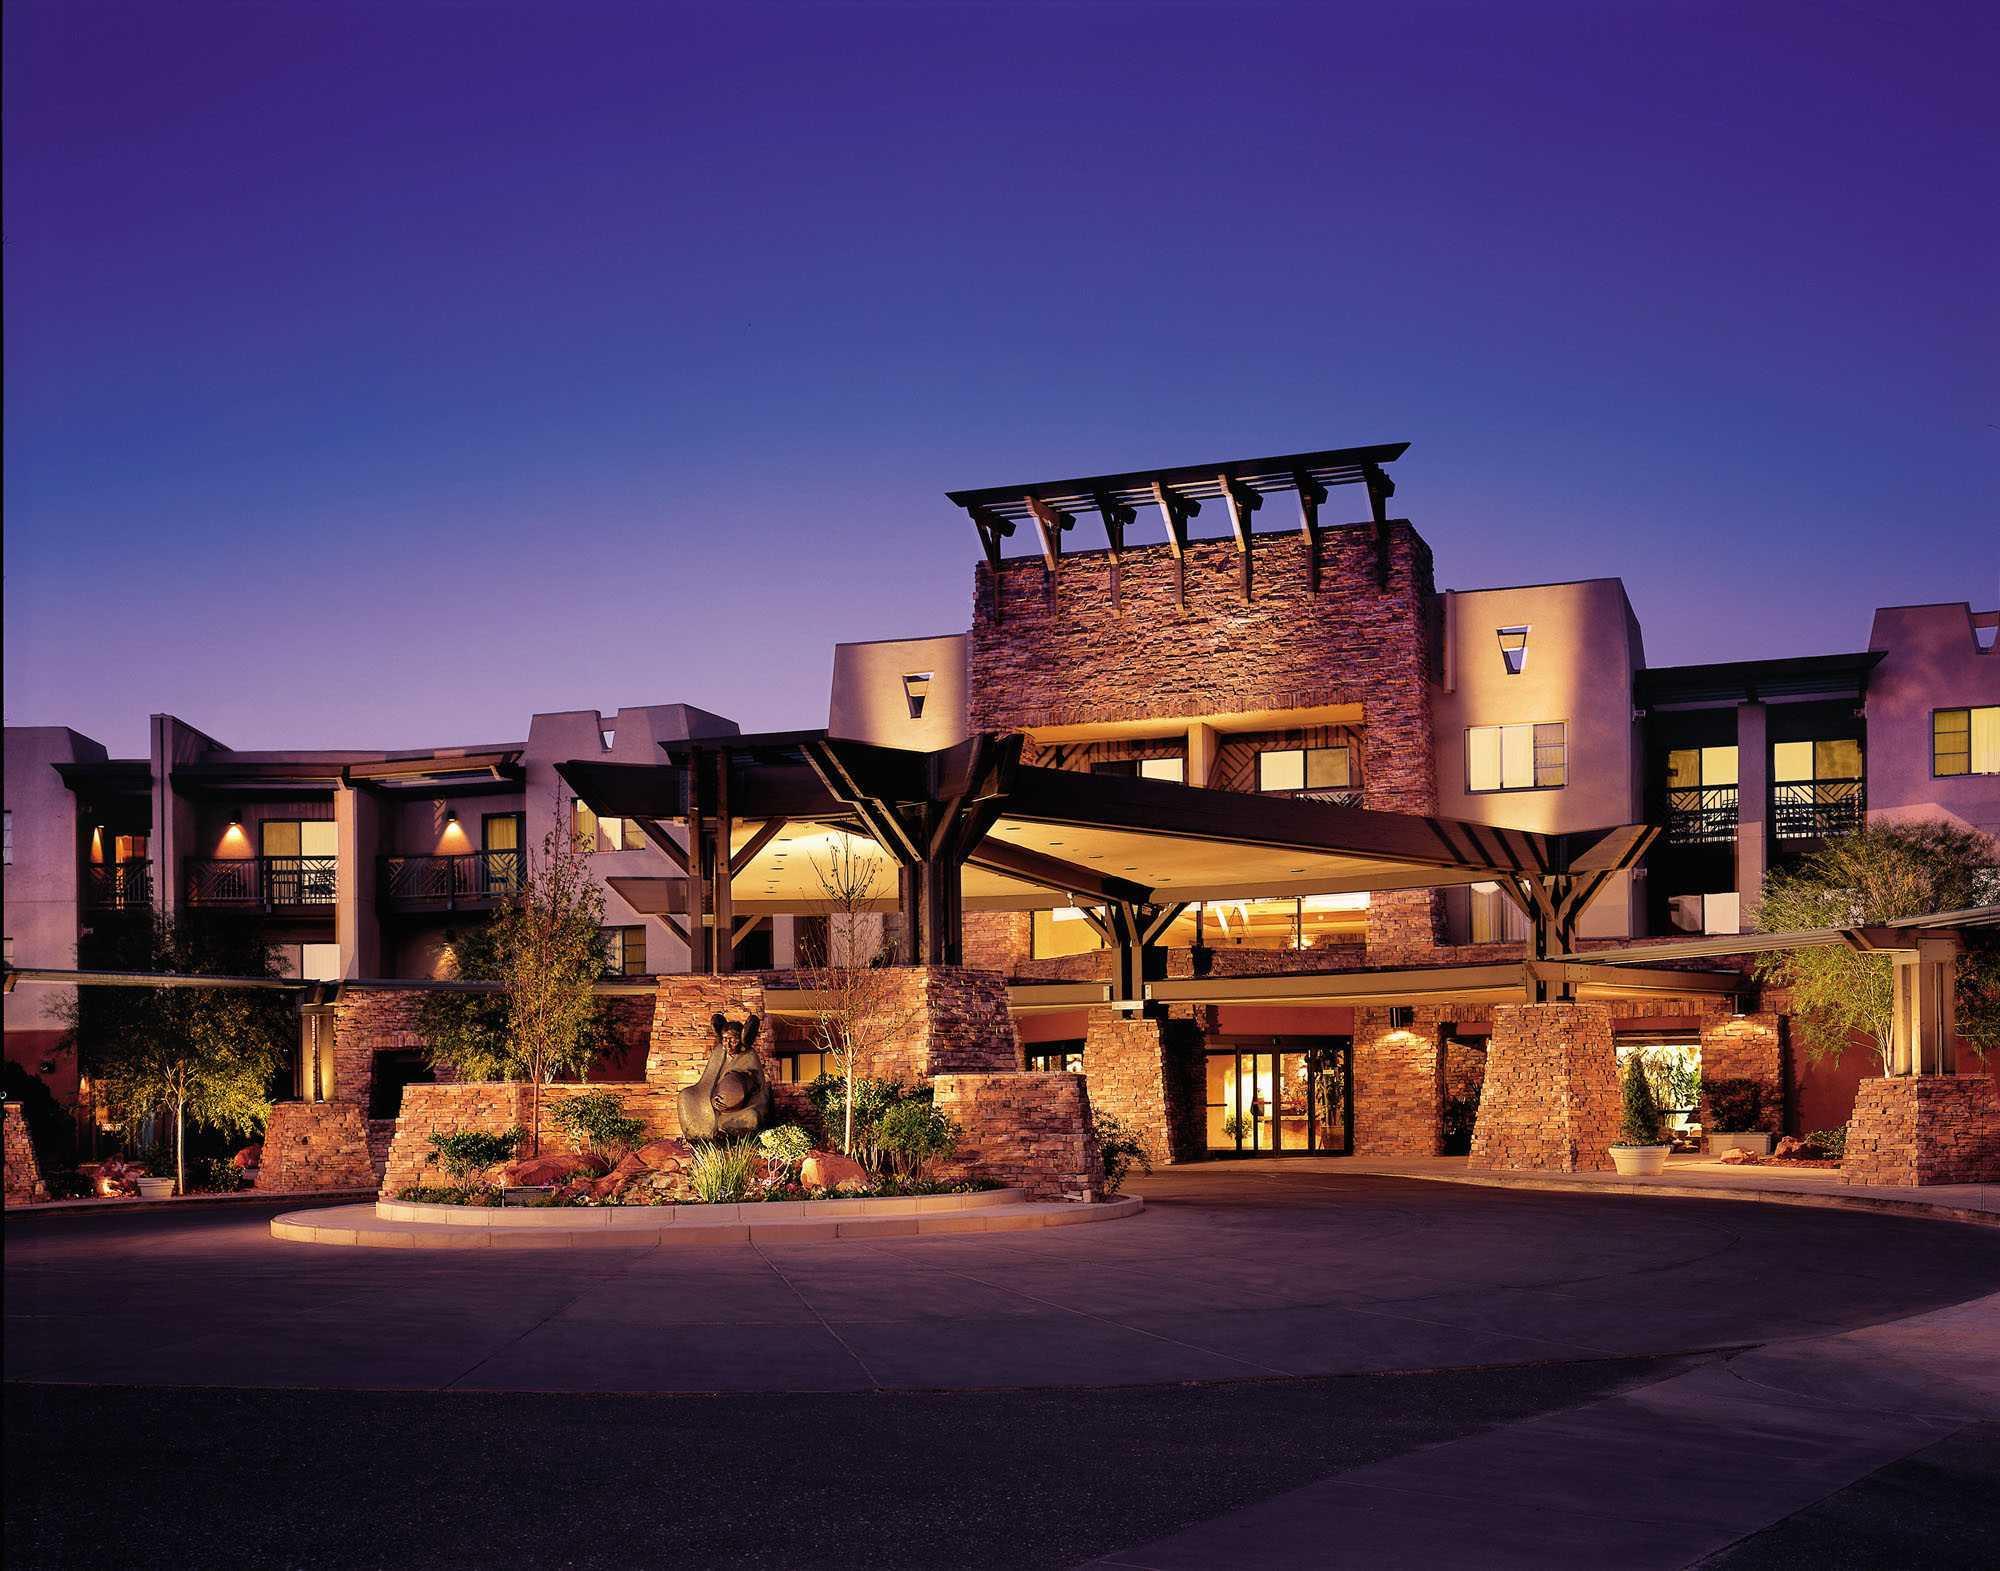 Las Vegas 2 Bedroom Suites Deals Hilton Sedona Resort And Spa